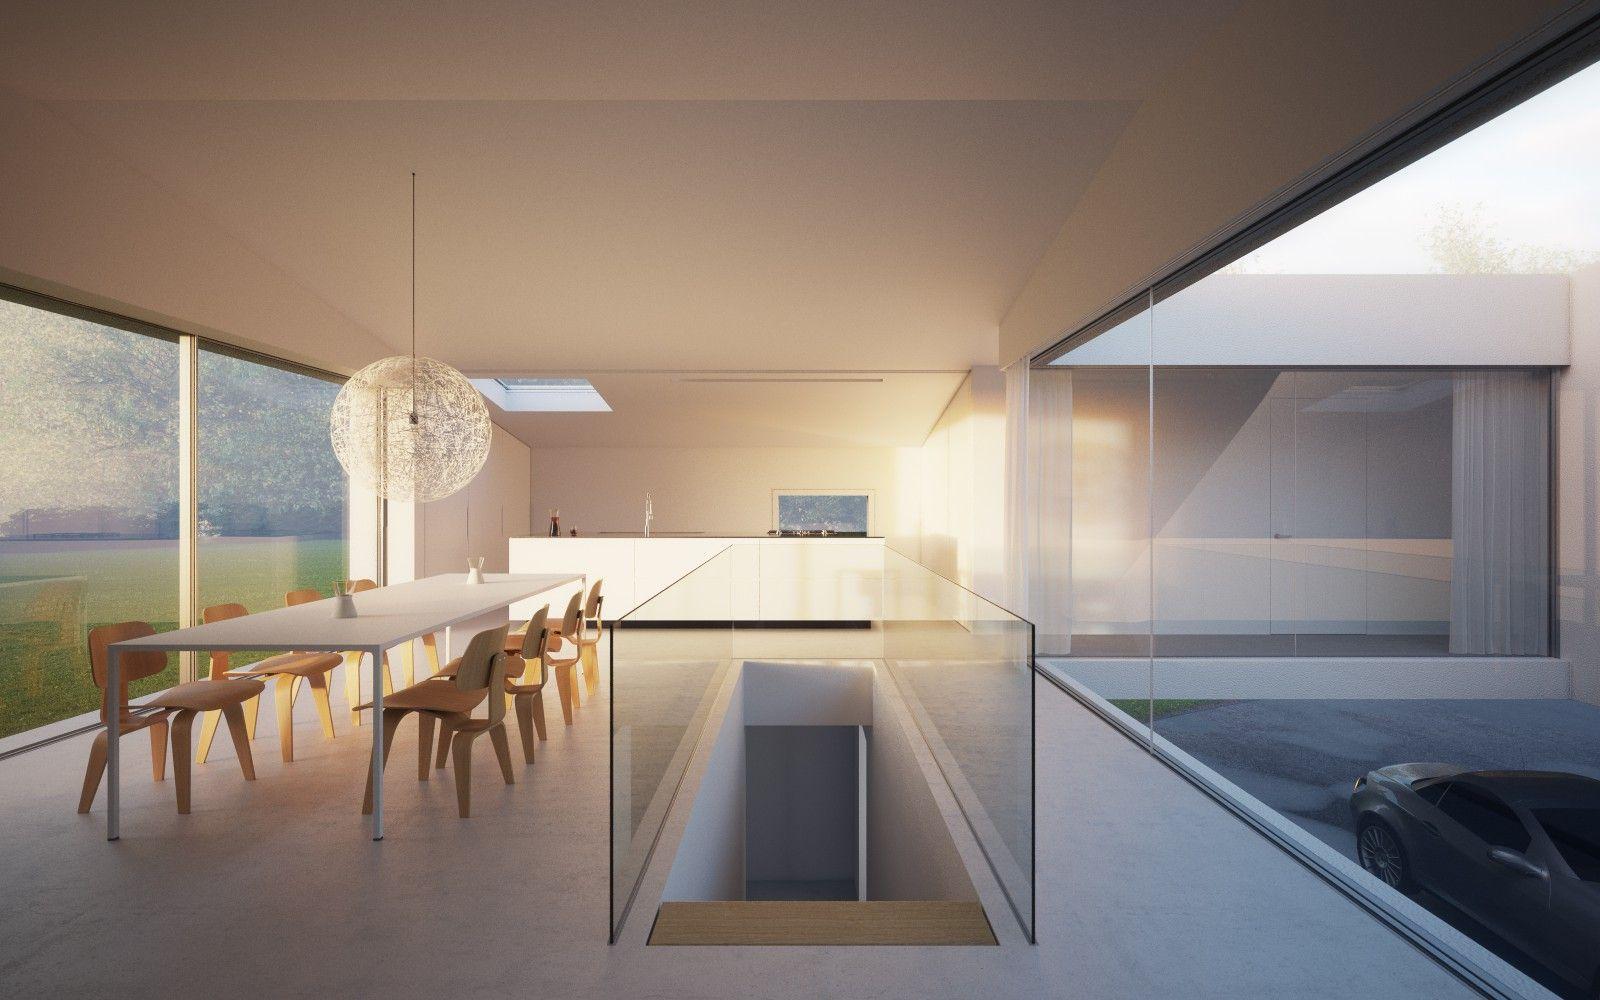 9852fb2122e93be864495d59a8578be1 Jpg 1 600 1 000 Pixel Flot Brug Af Glas Glastrappe Le Architecture House Interior Architecture Design Minimalism Interior